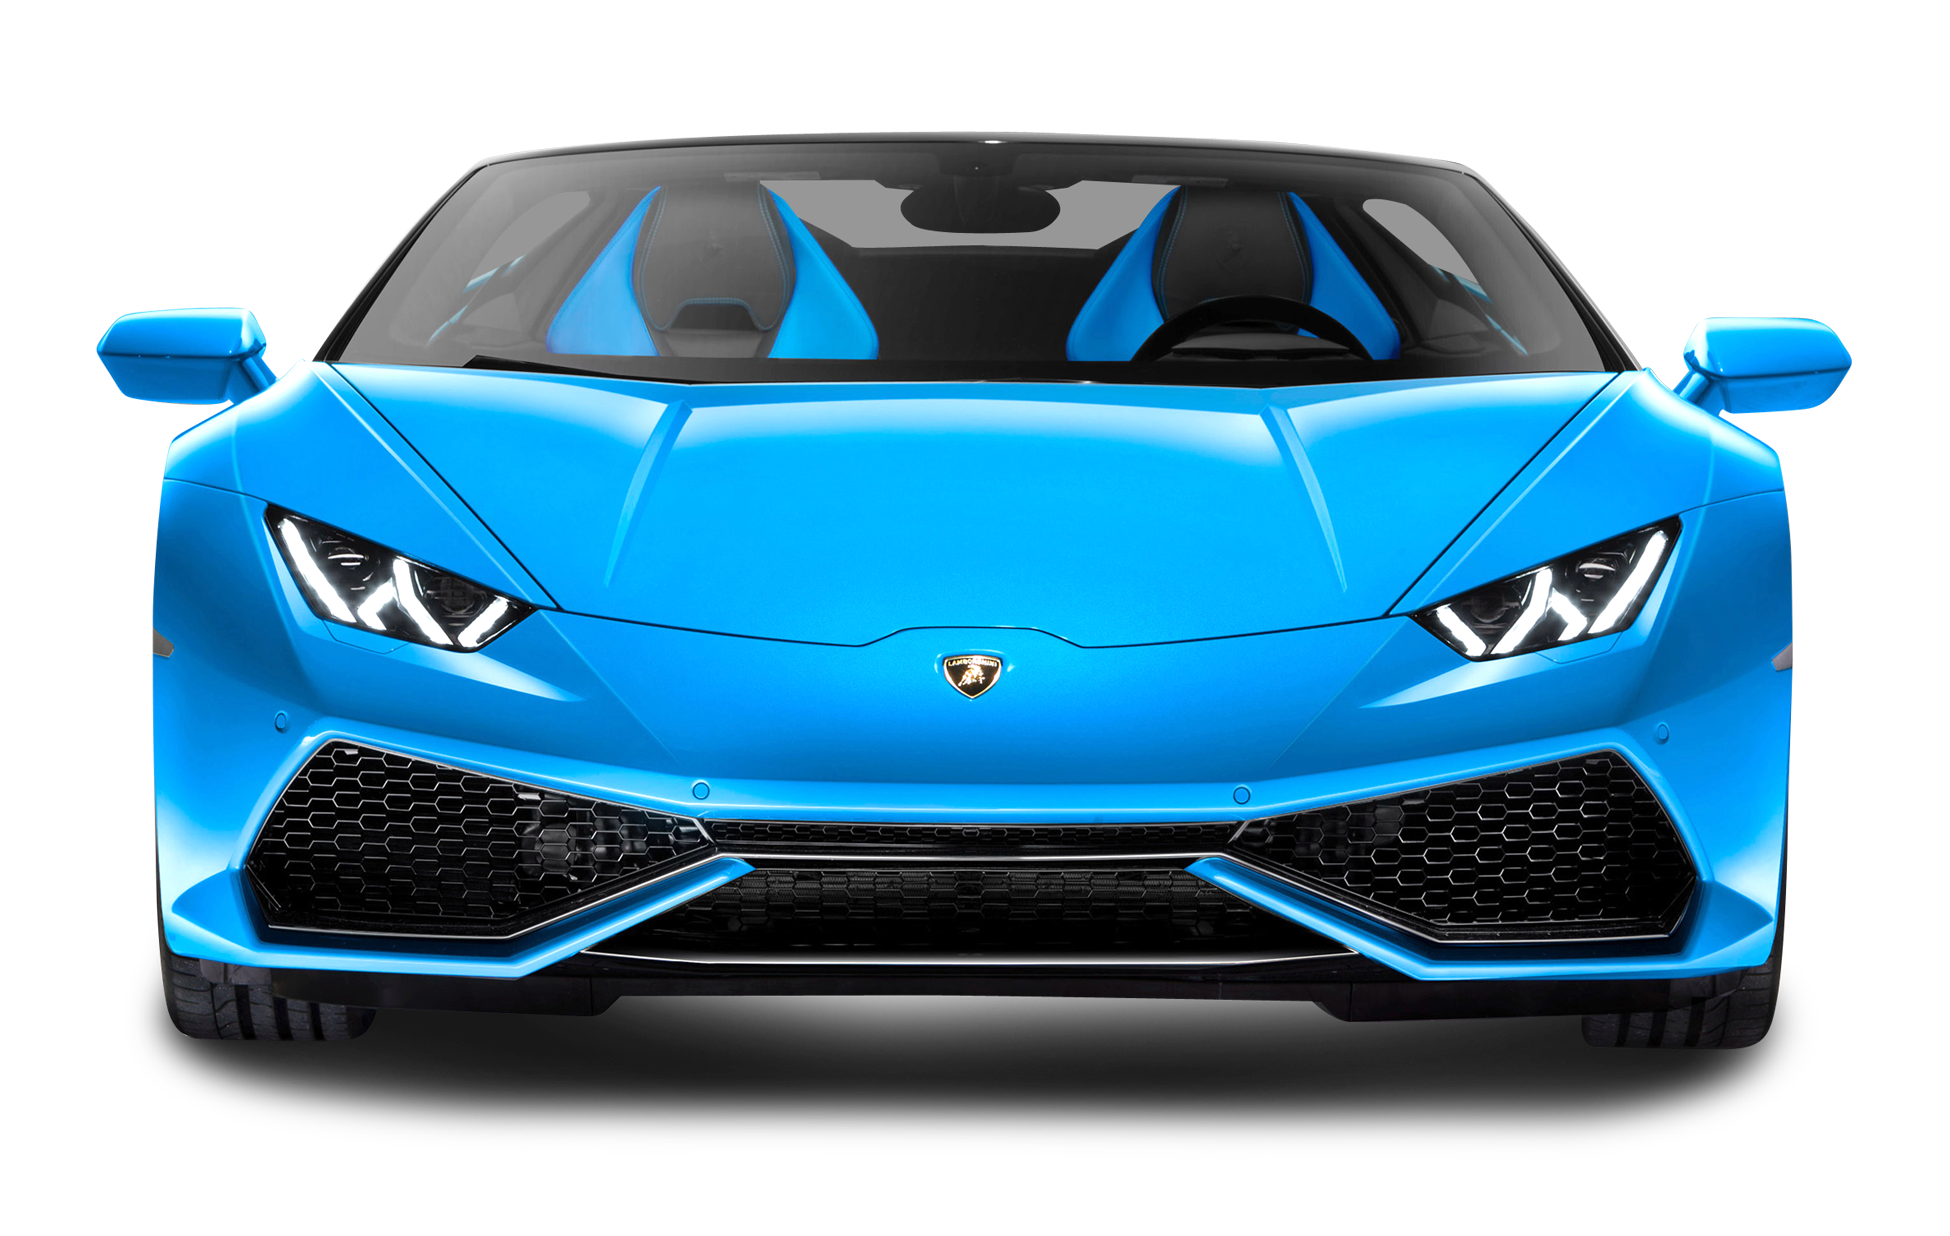 PNGPIX COM Blue Lamborghini Huracan LP 610 4